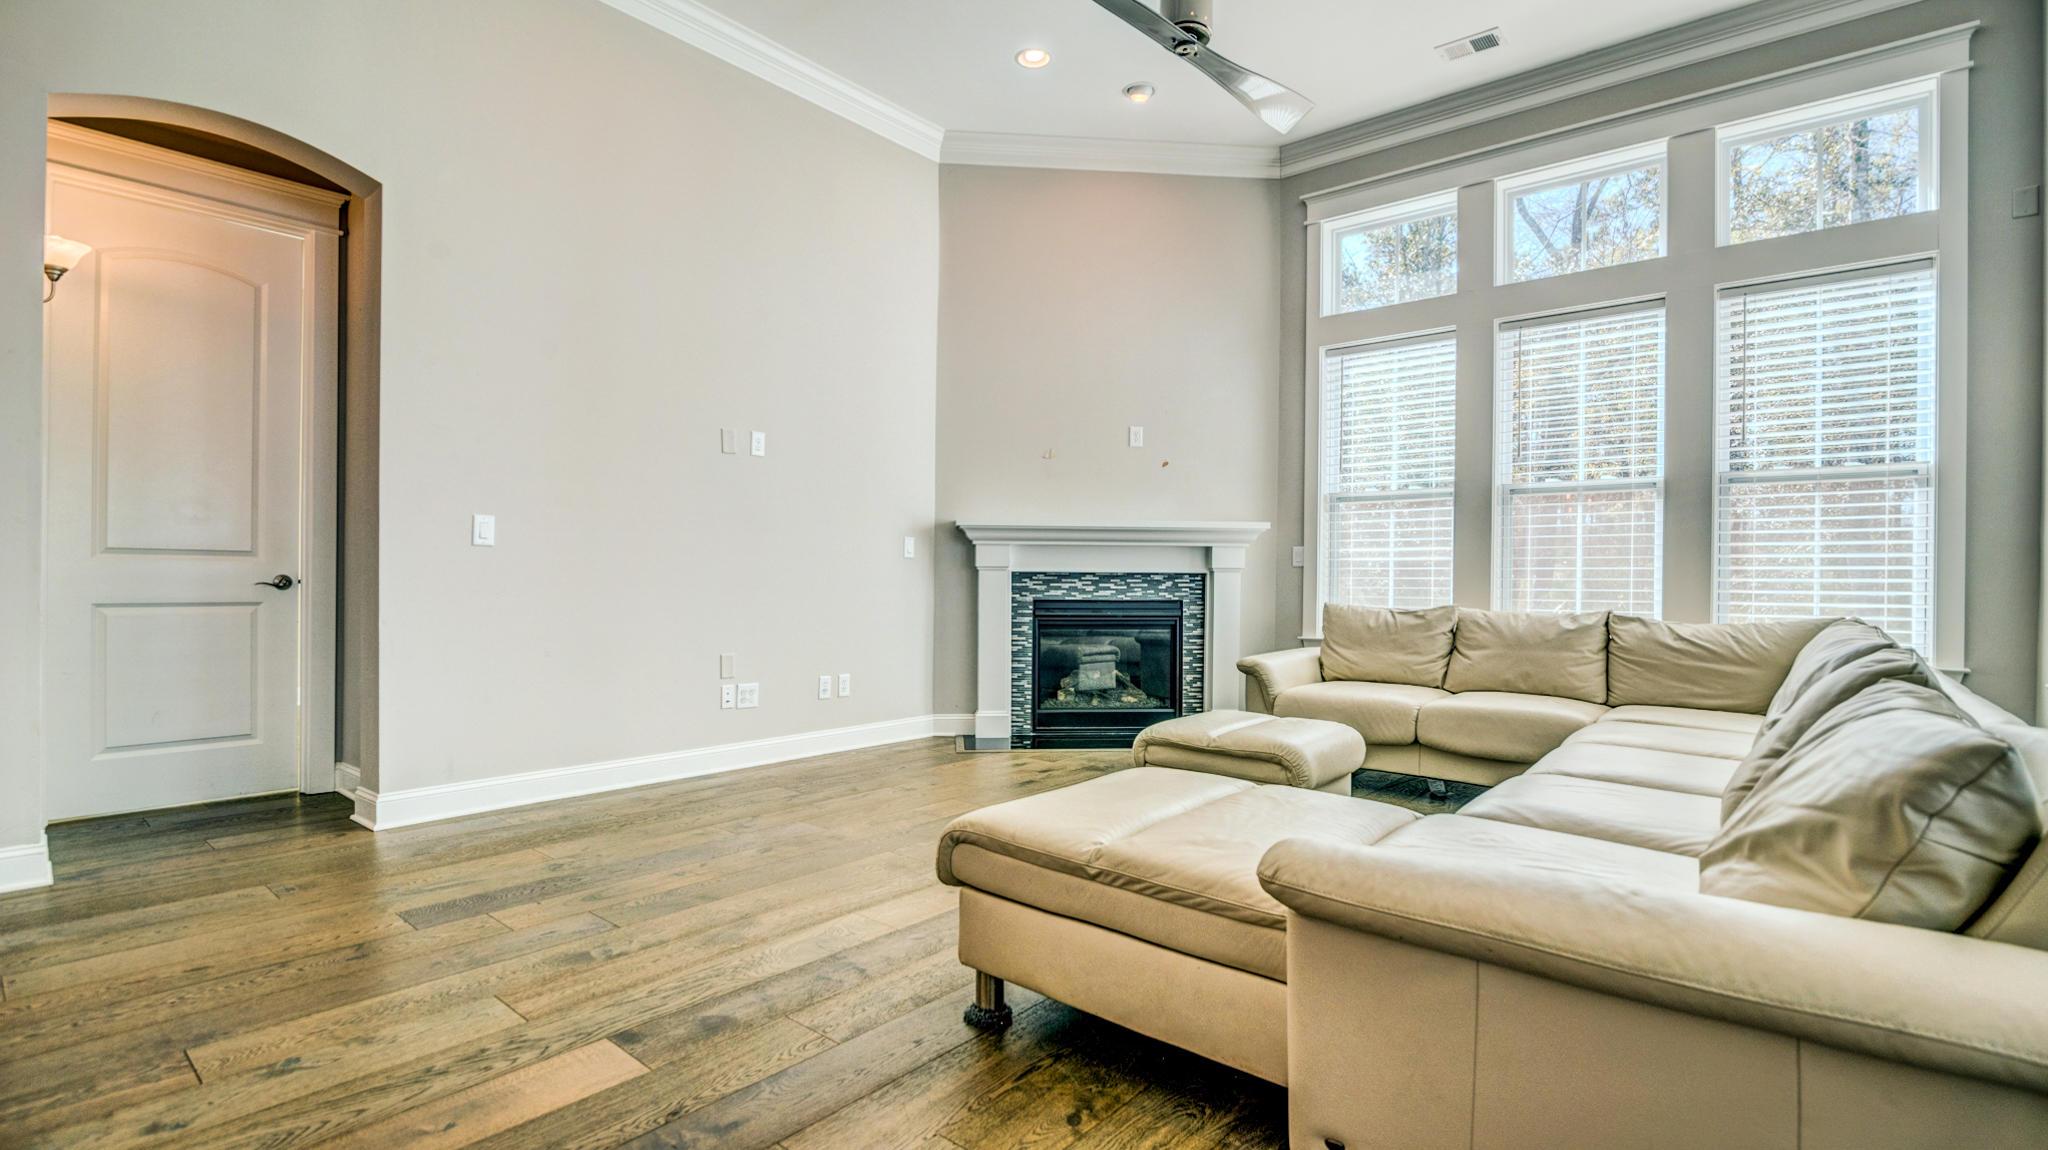 Carolina Park Homes For Sale - 3687 Spindrift, Mount Pleasant, SC - 7